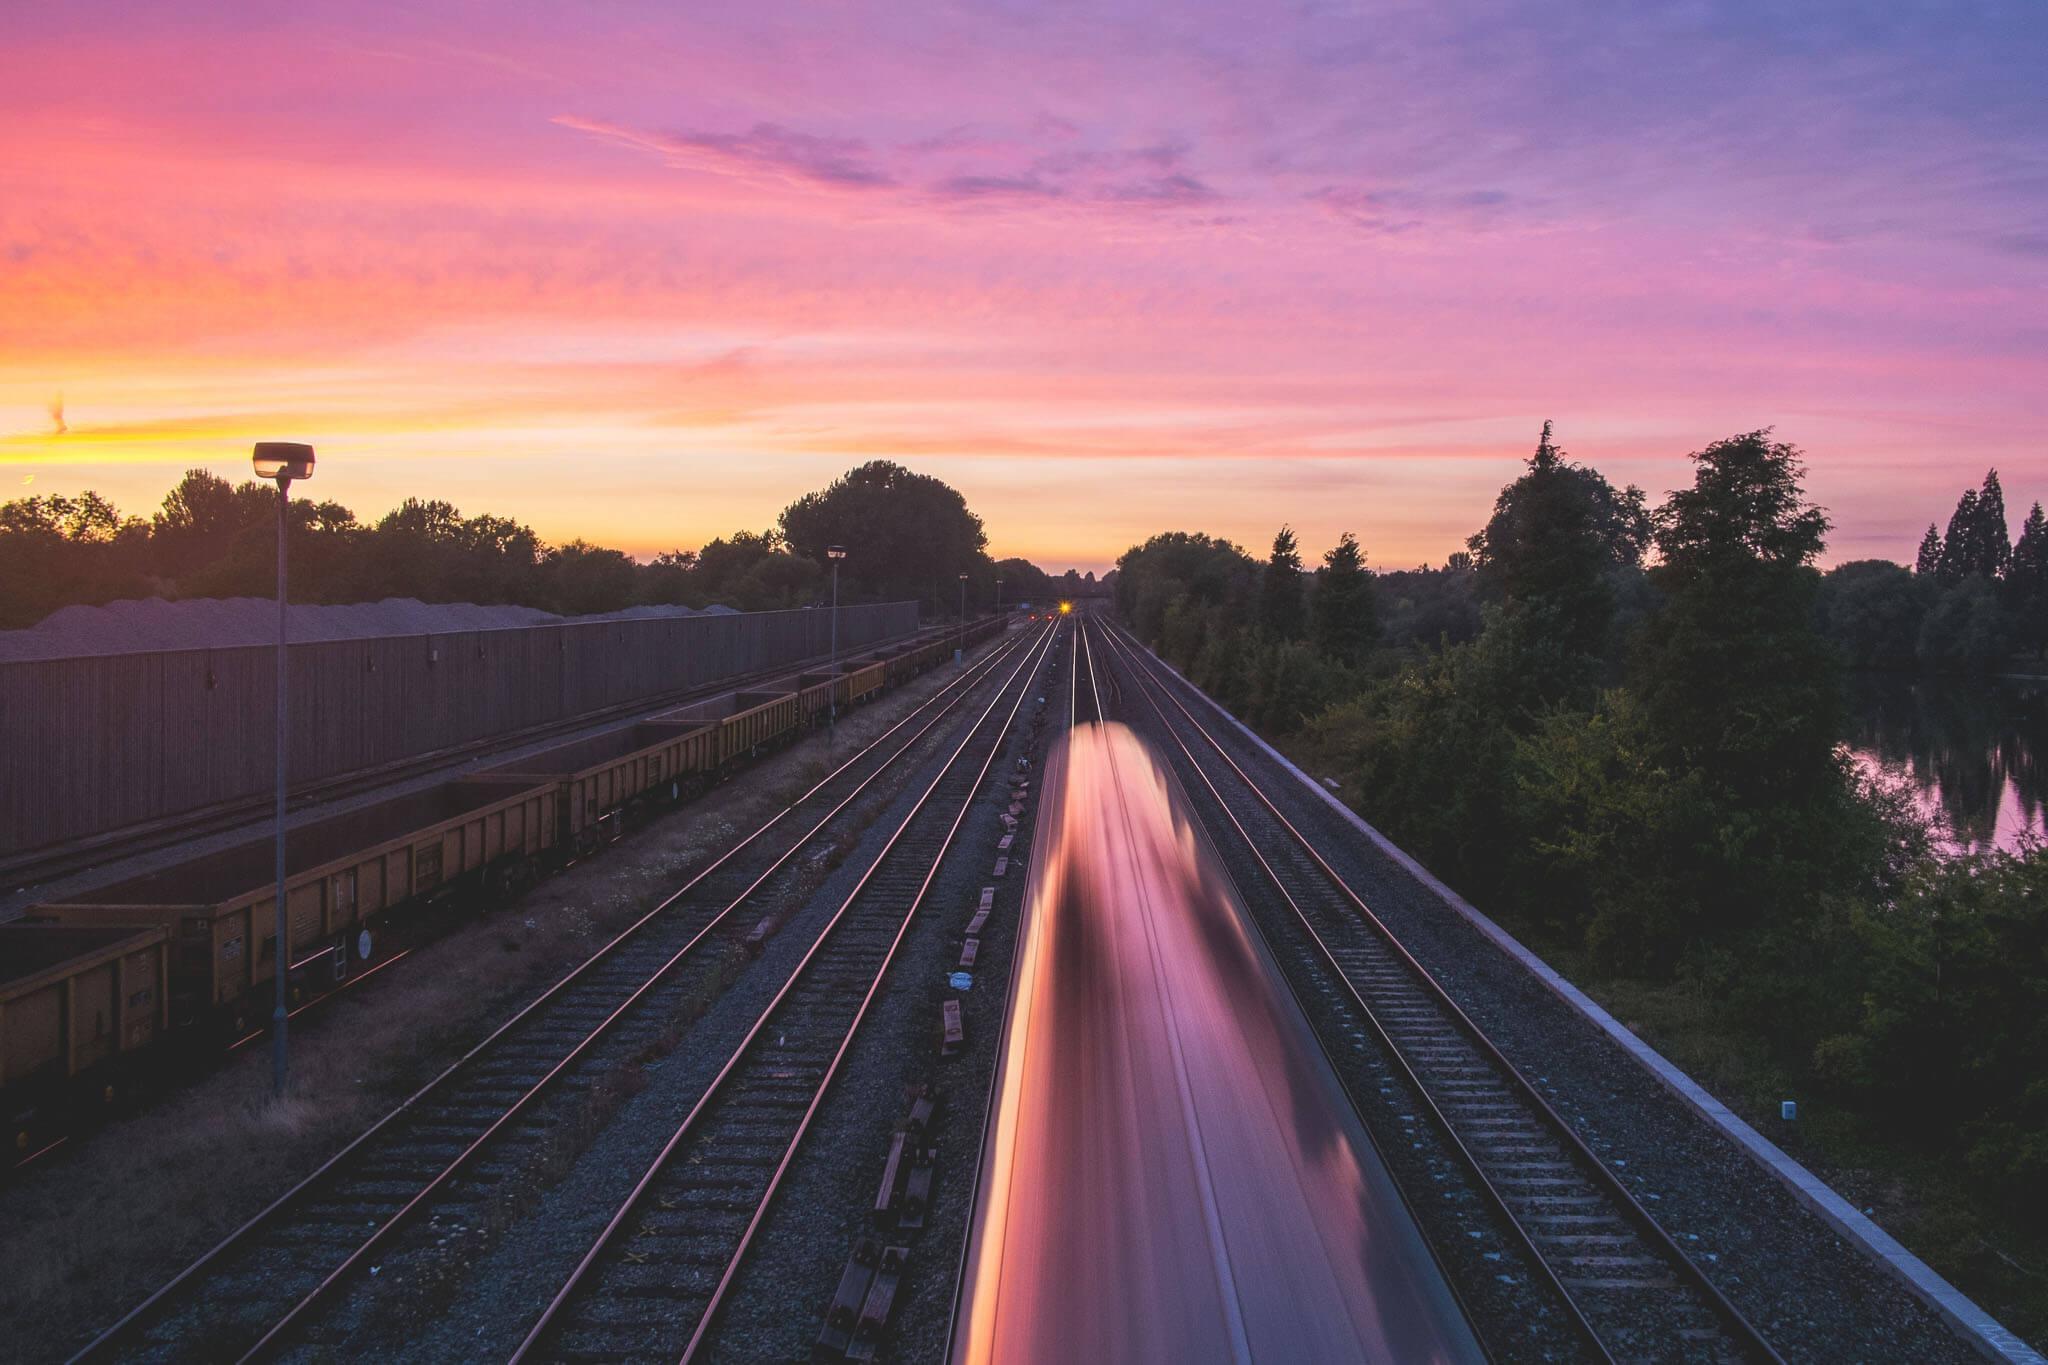 Commute by train